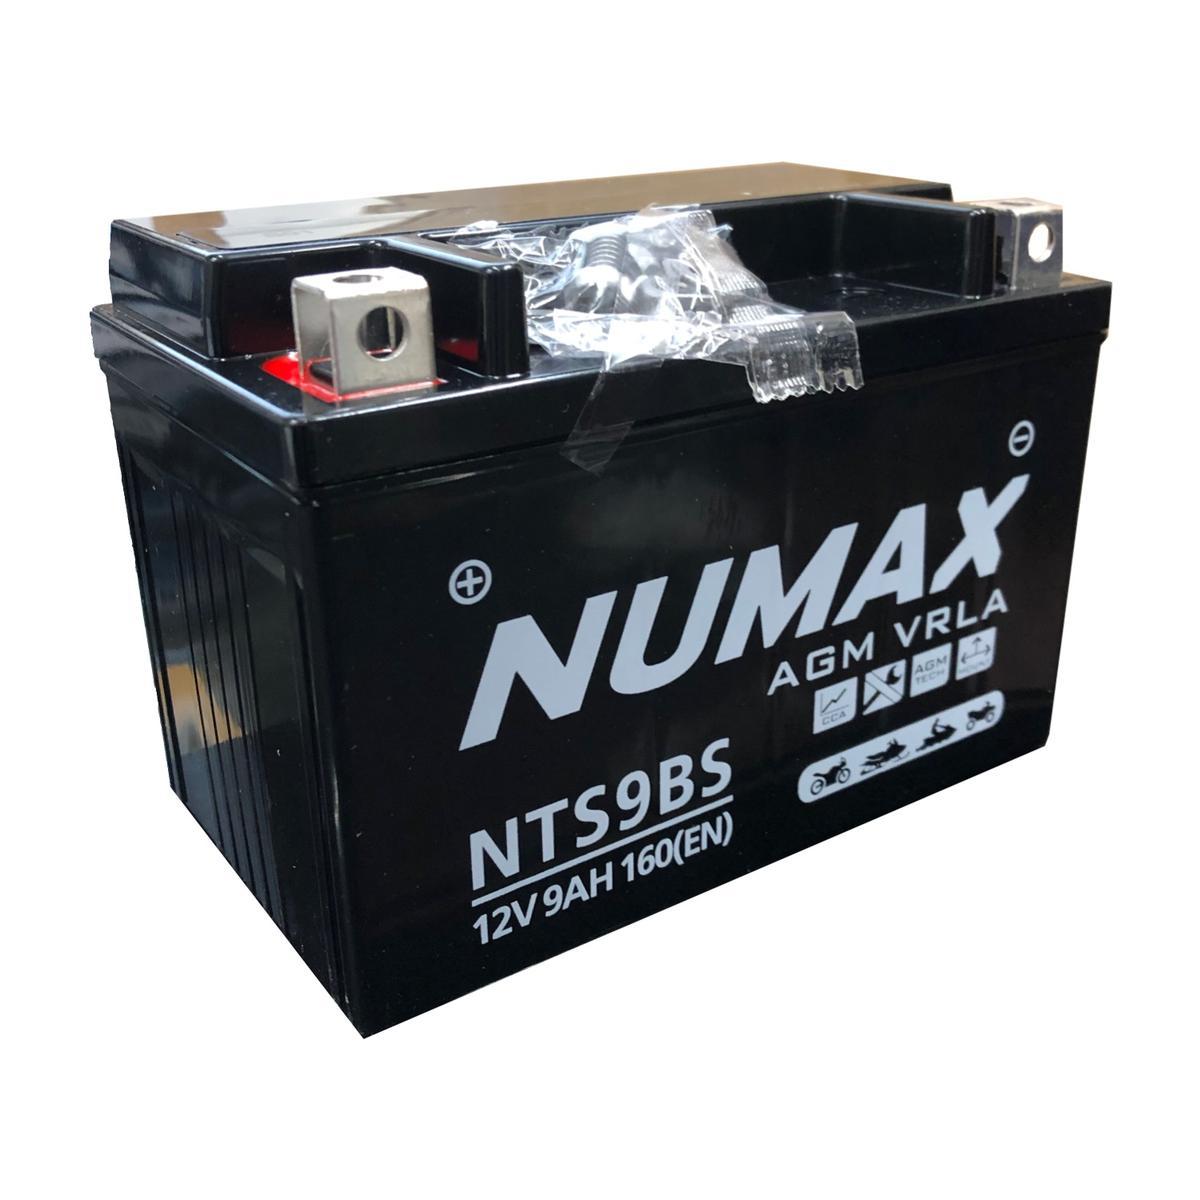 Numax NTS9BS 12v Motorbike Bike Battery KYMCO 125cc Dink YXT9-4